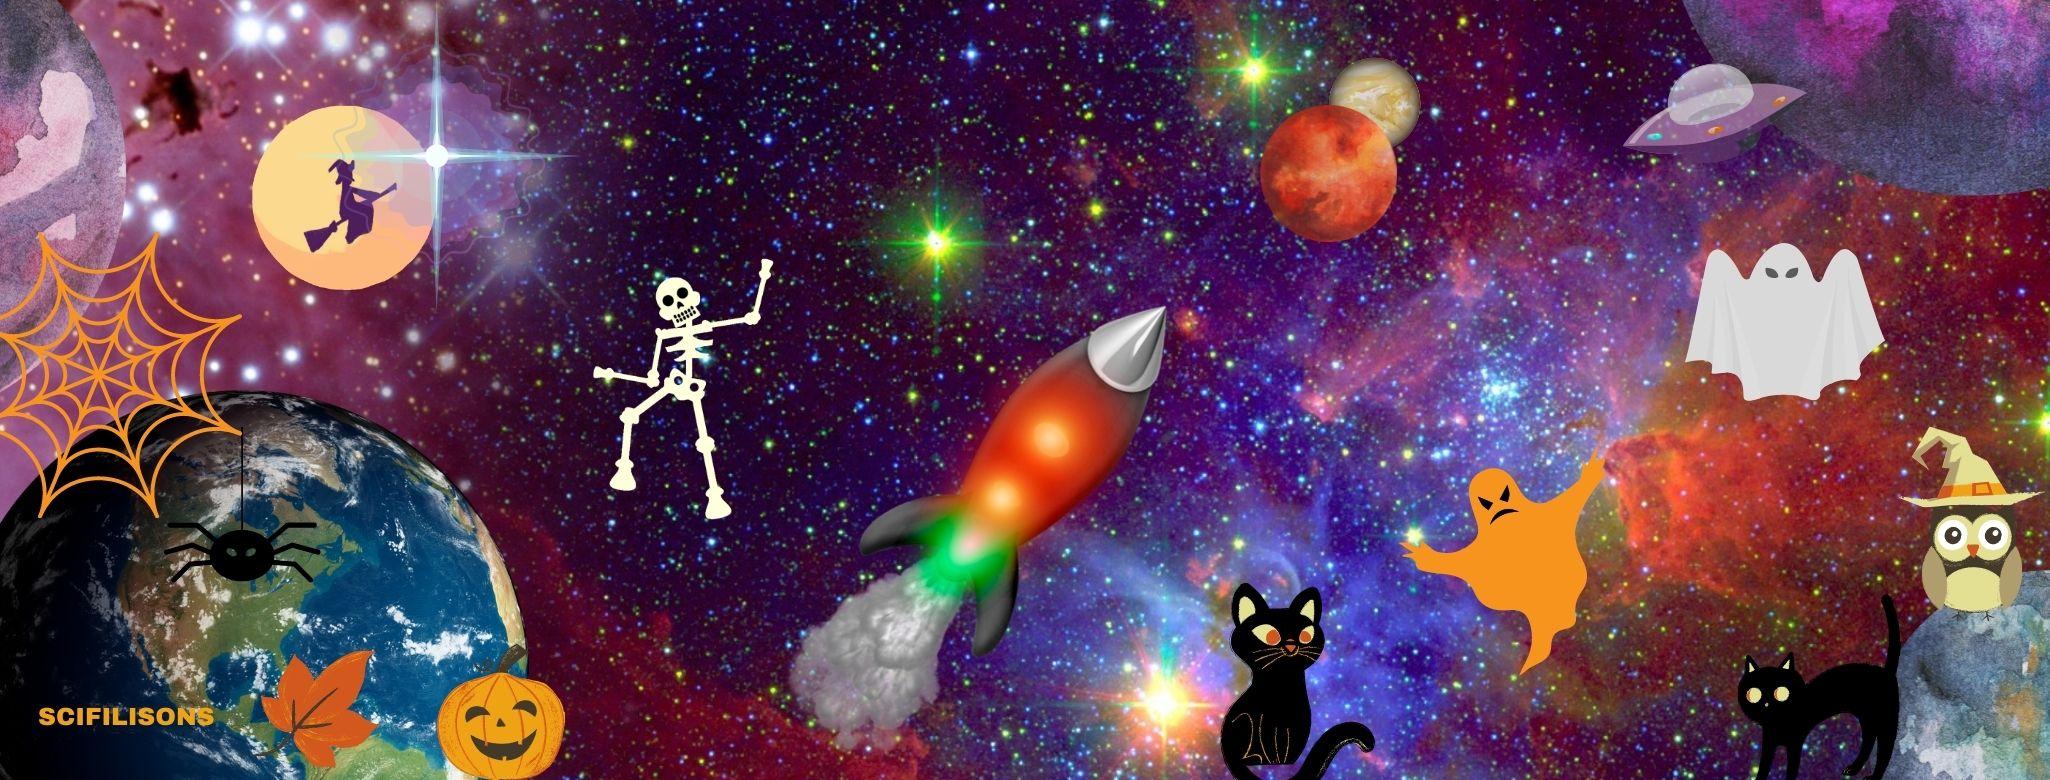 bandeau Halloween Scifilisons 2021 Canva